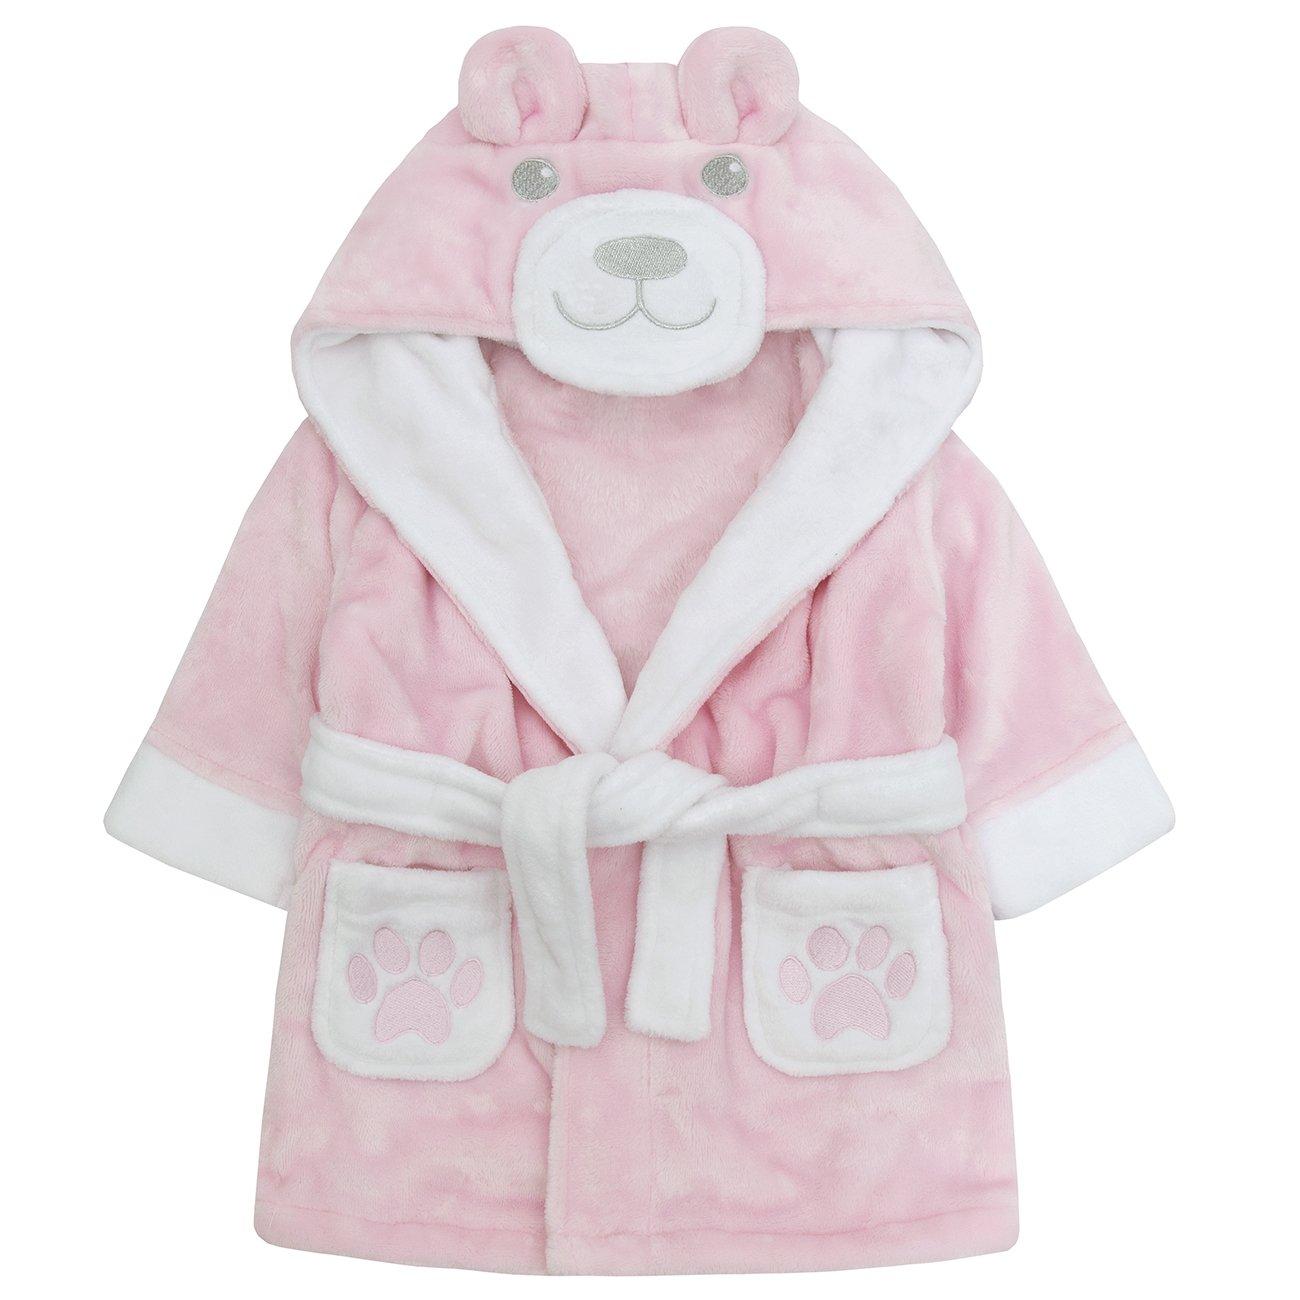 BABY TOWN Babytown Newborn Baby Girls Fleece Dressing Gown - Soft Pink Bear Bath Robe 18C398